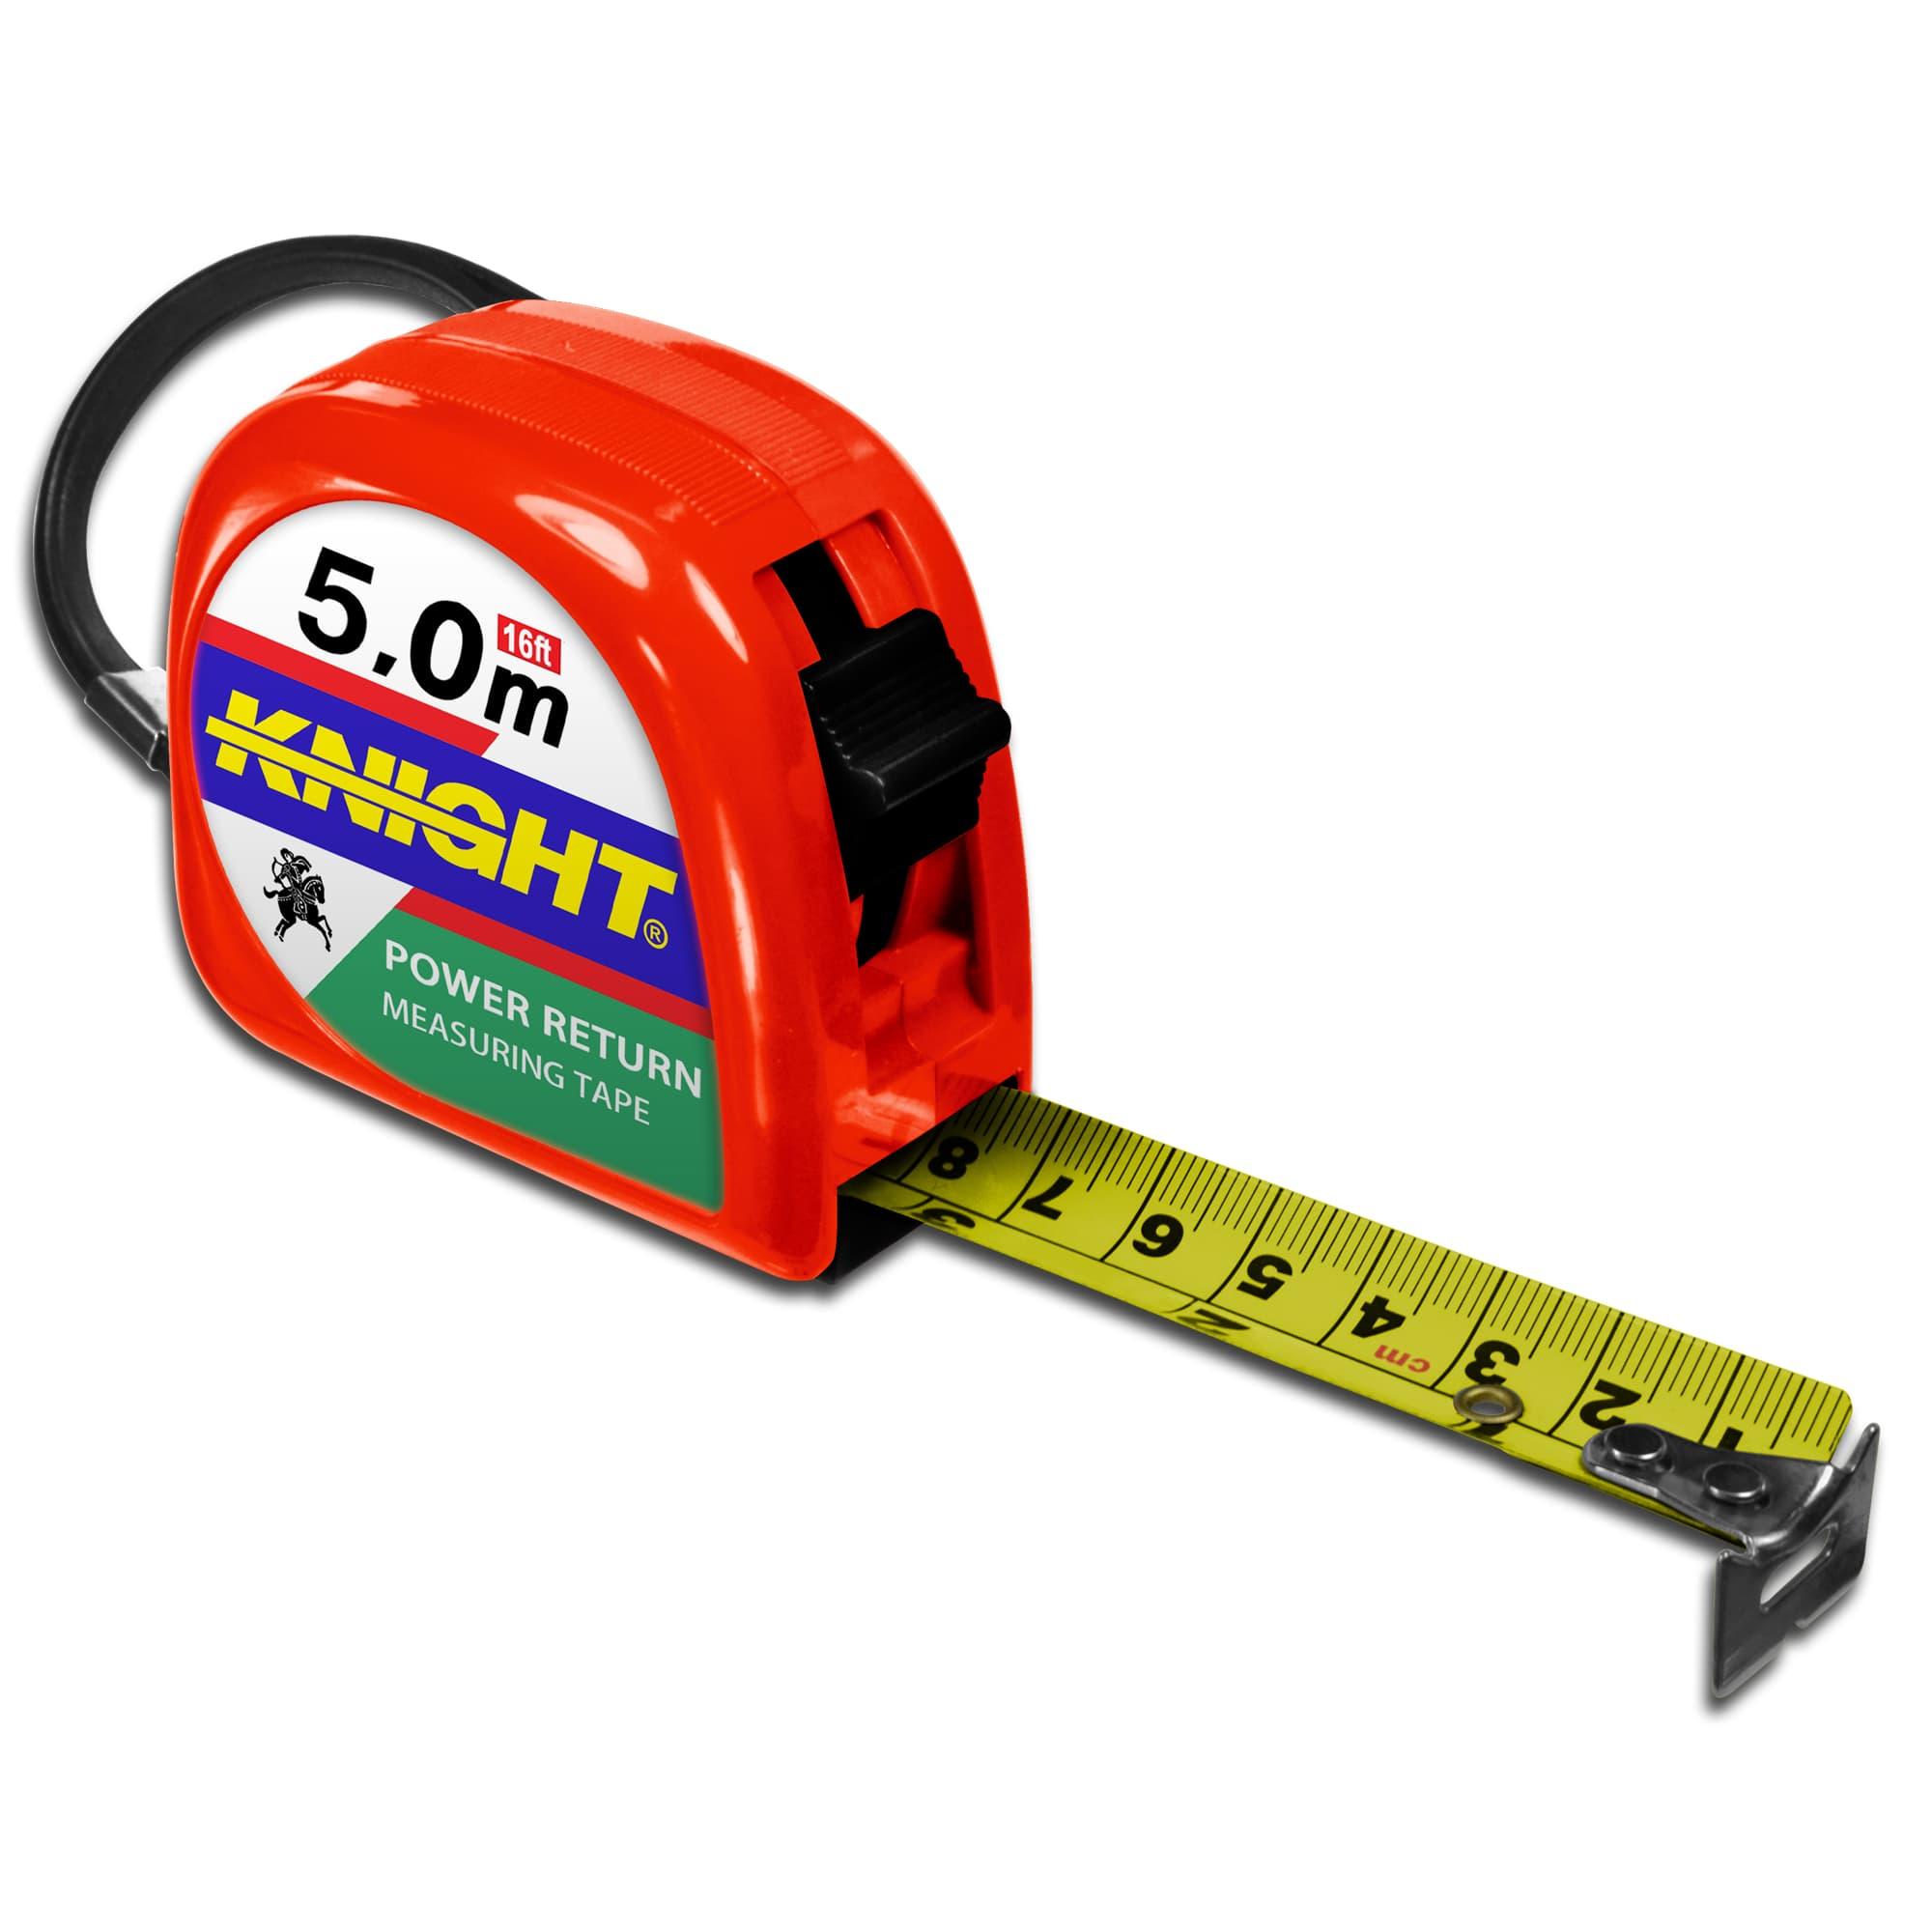 Professional Measuring Tools Tape Measure